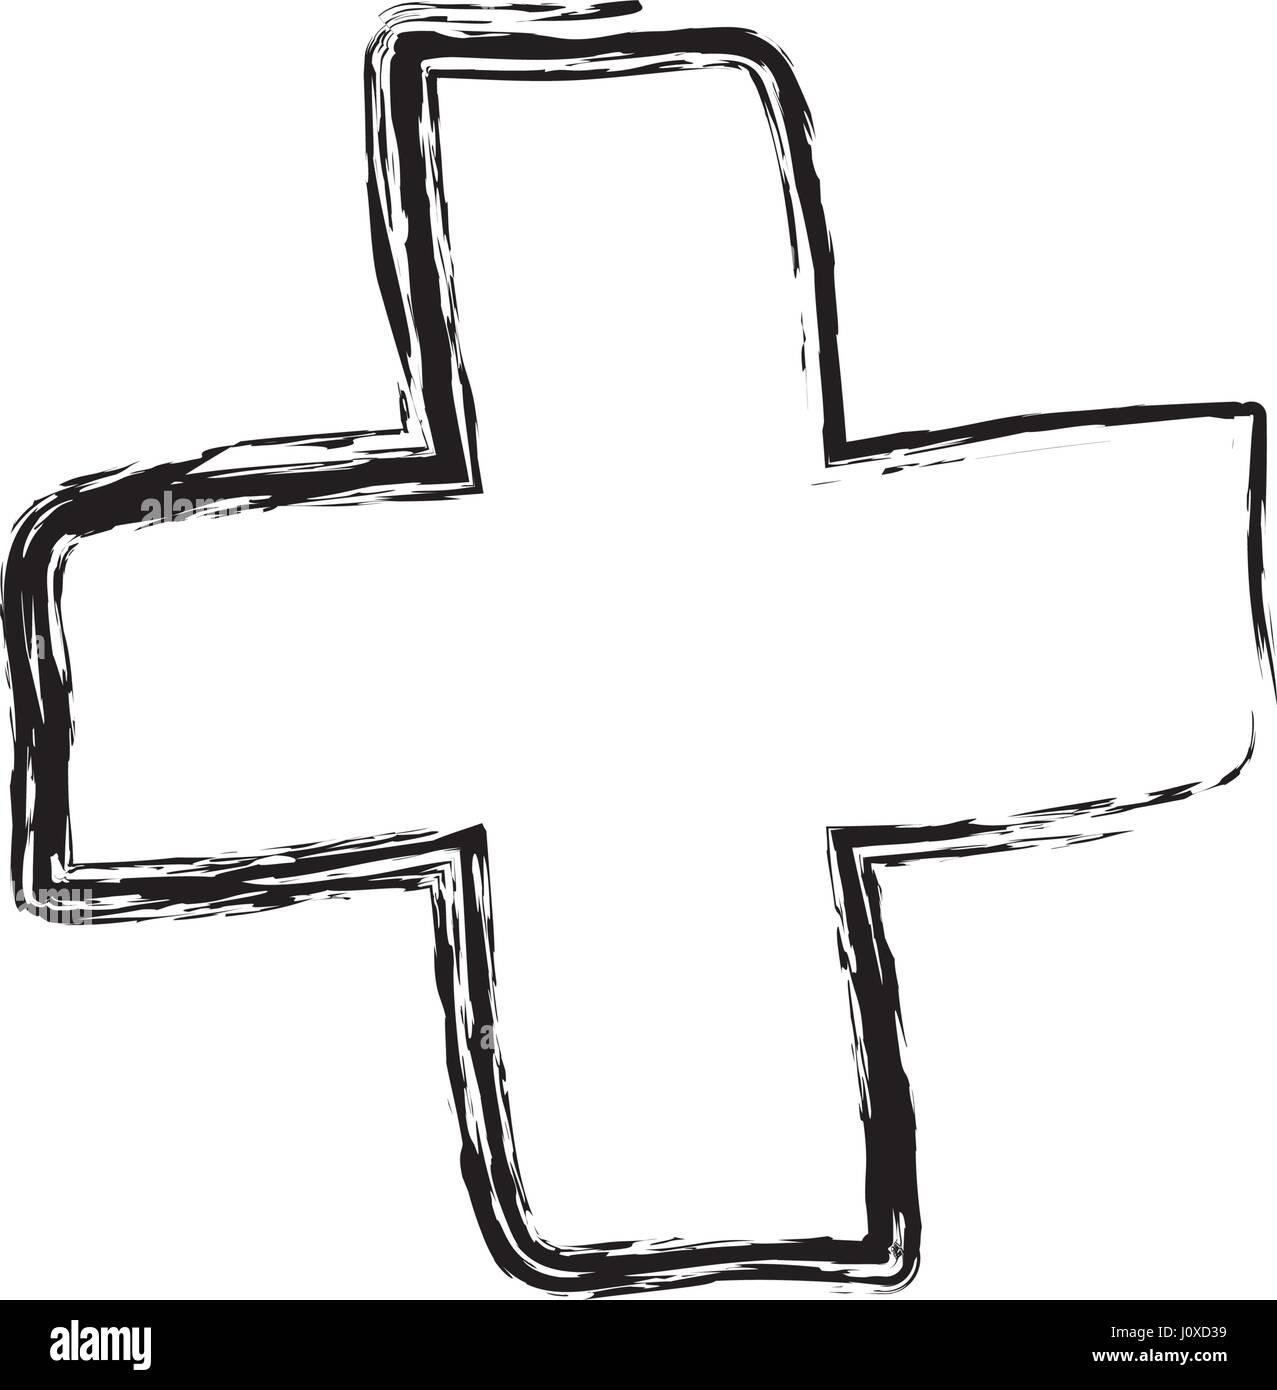 Swiss Cross Logo Stock Photos Amp Swiss Cross Logo Stock